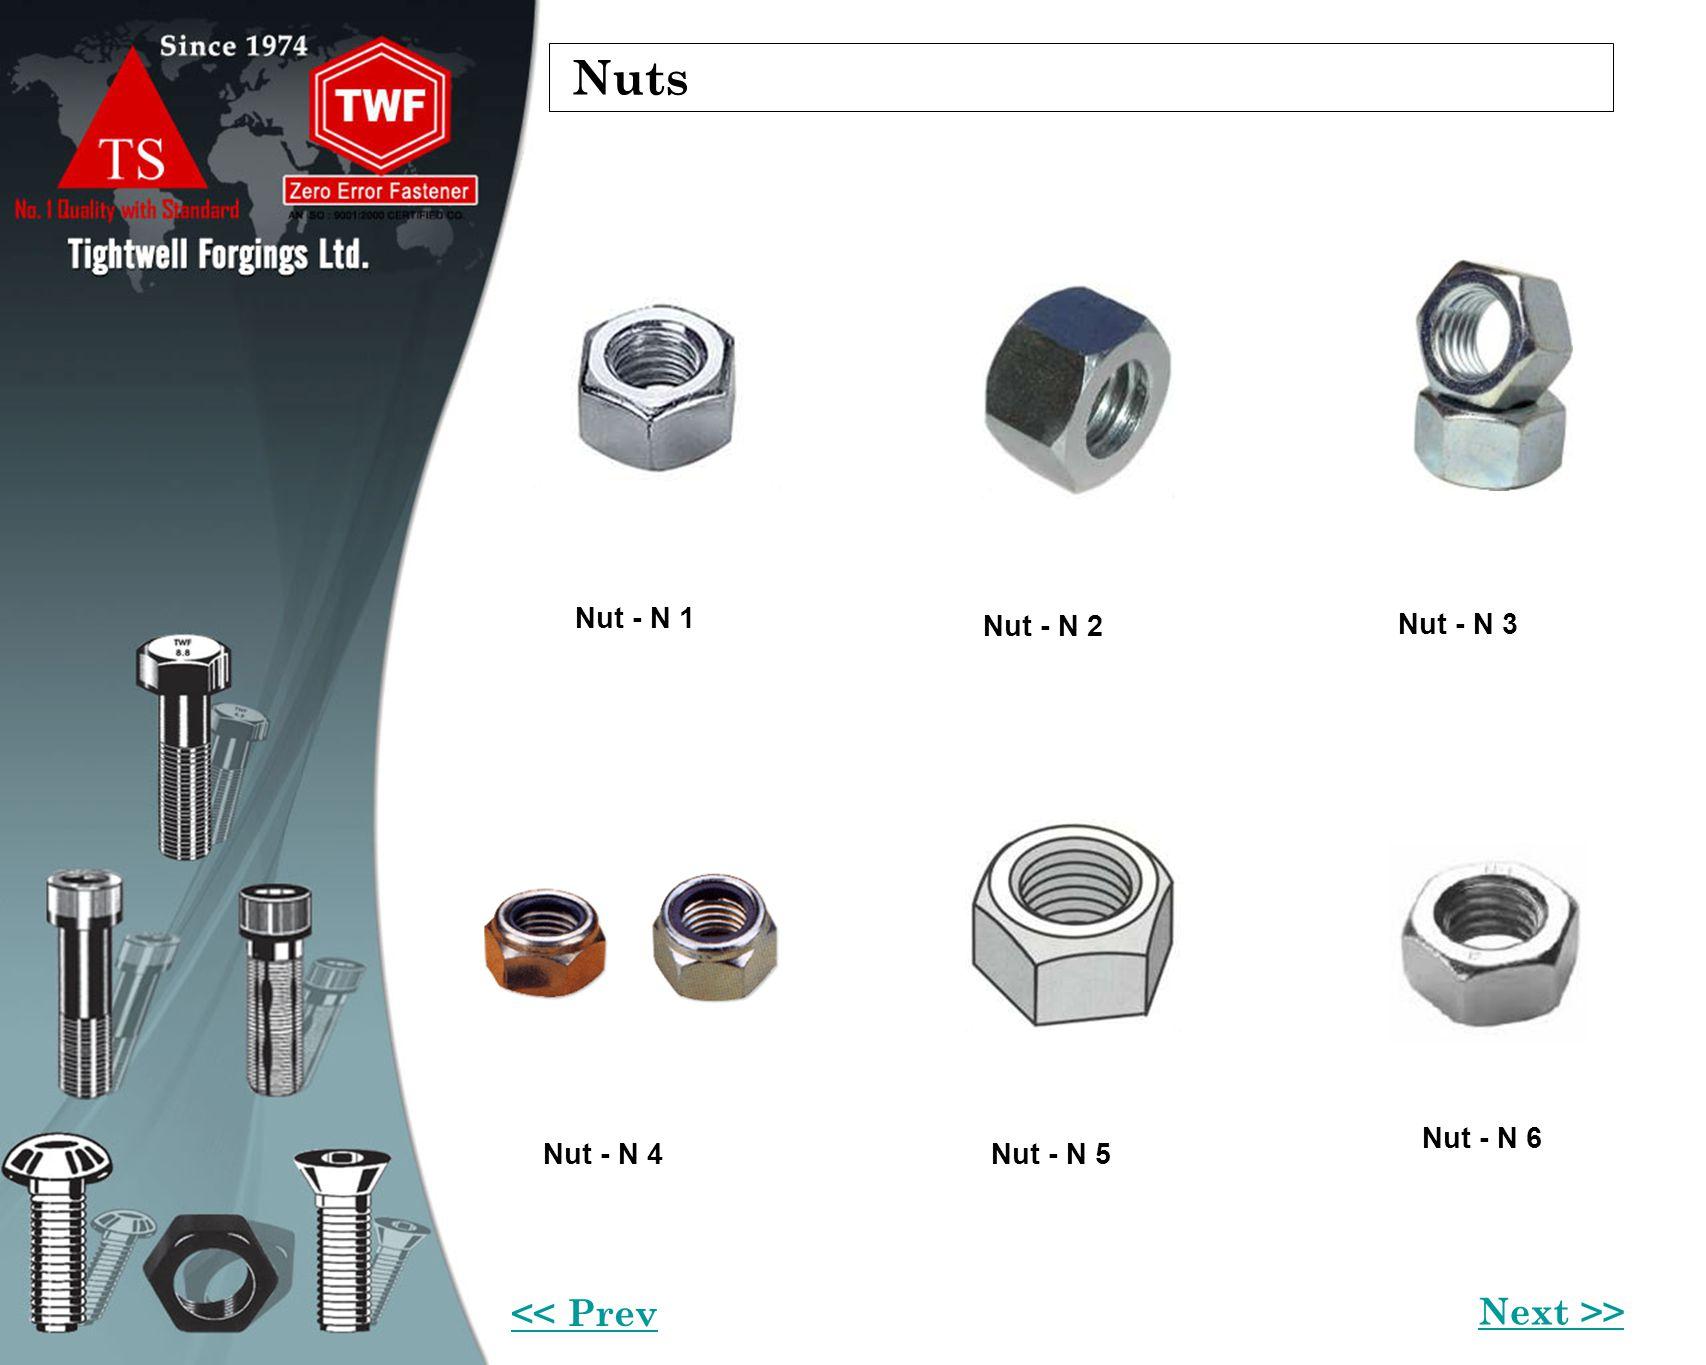 Nuts Nut - N 1 Nut - N 2 Nut - N 3 Nut - N 6 Nut - N 5Nut - N 4 Next >> << Prev